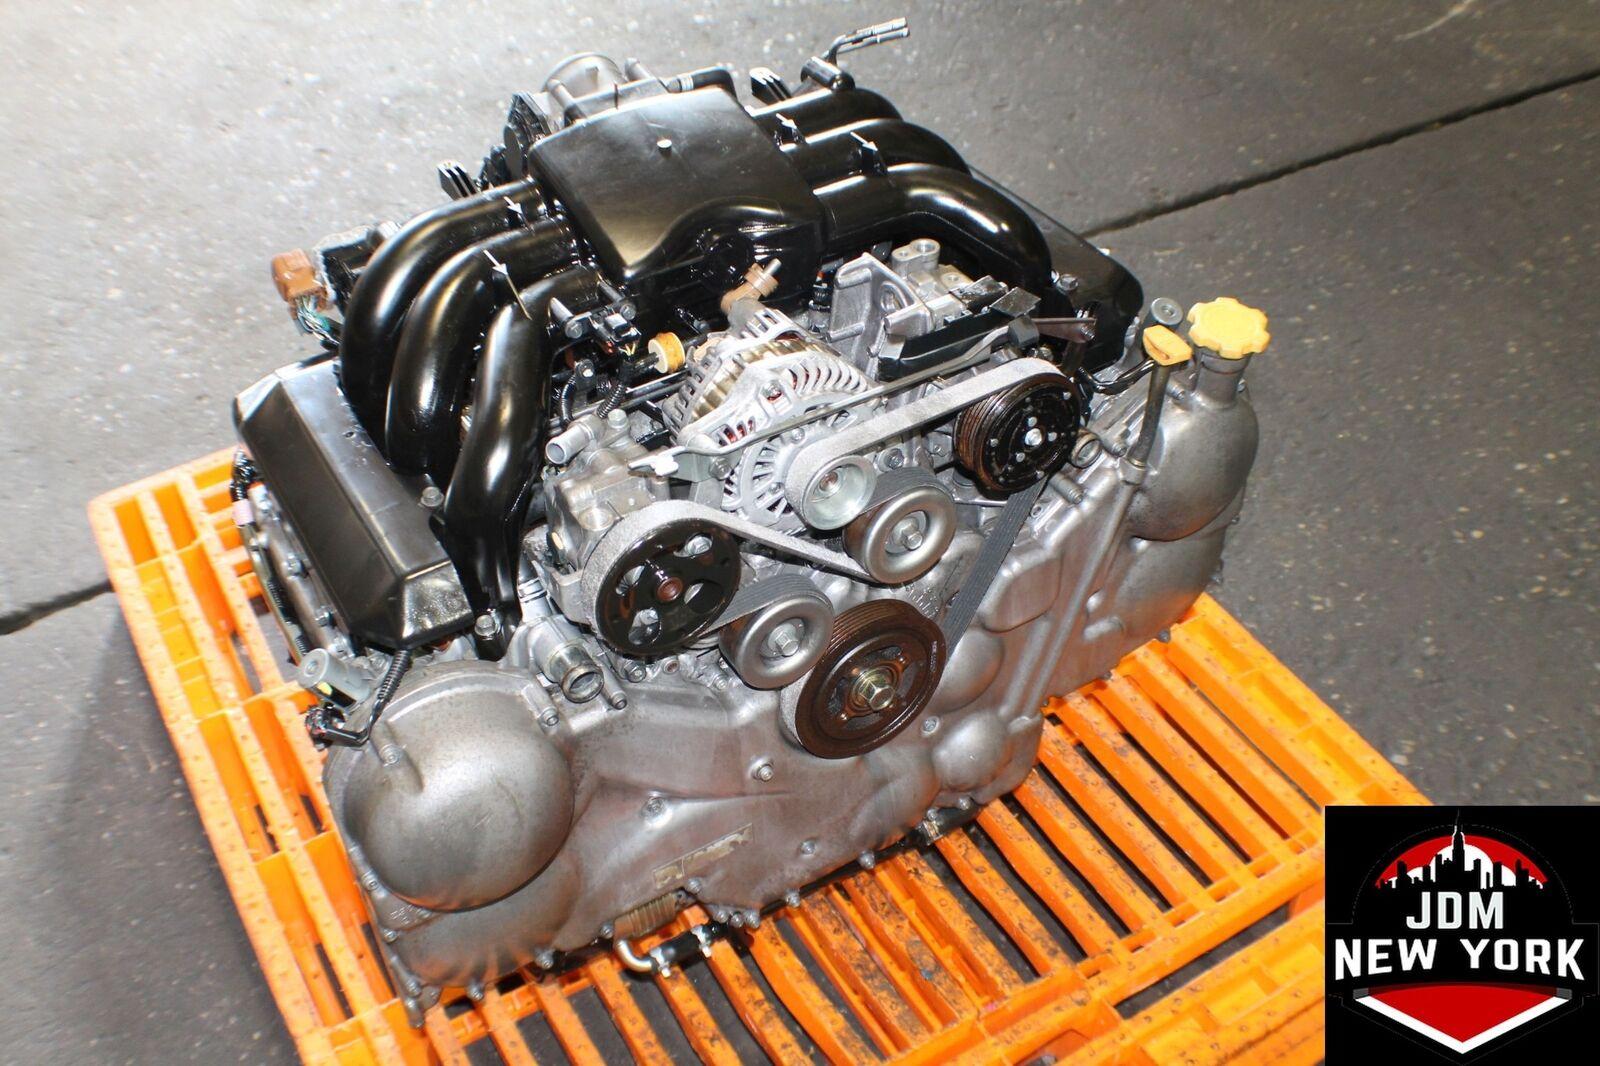 2003 2009 subaru legacy 3 0r 3 0l h6 engine jdm ez30r jdm new york 2003 2009 subaru legacy 3 0r 3 0l h6 engine jdm ez30r